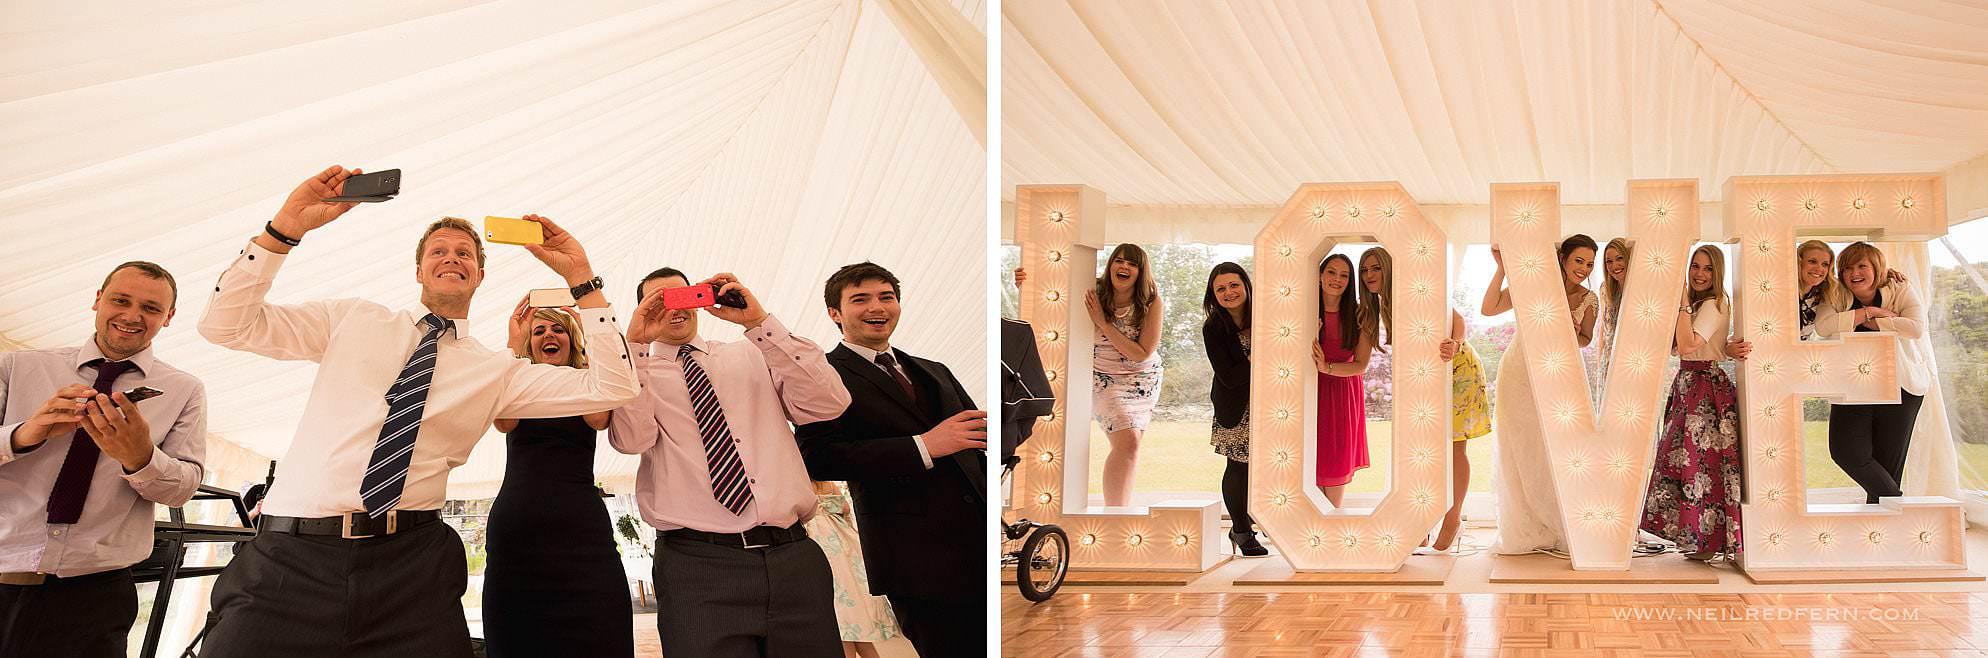 Cragwood Hotel wedding photographs 15